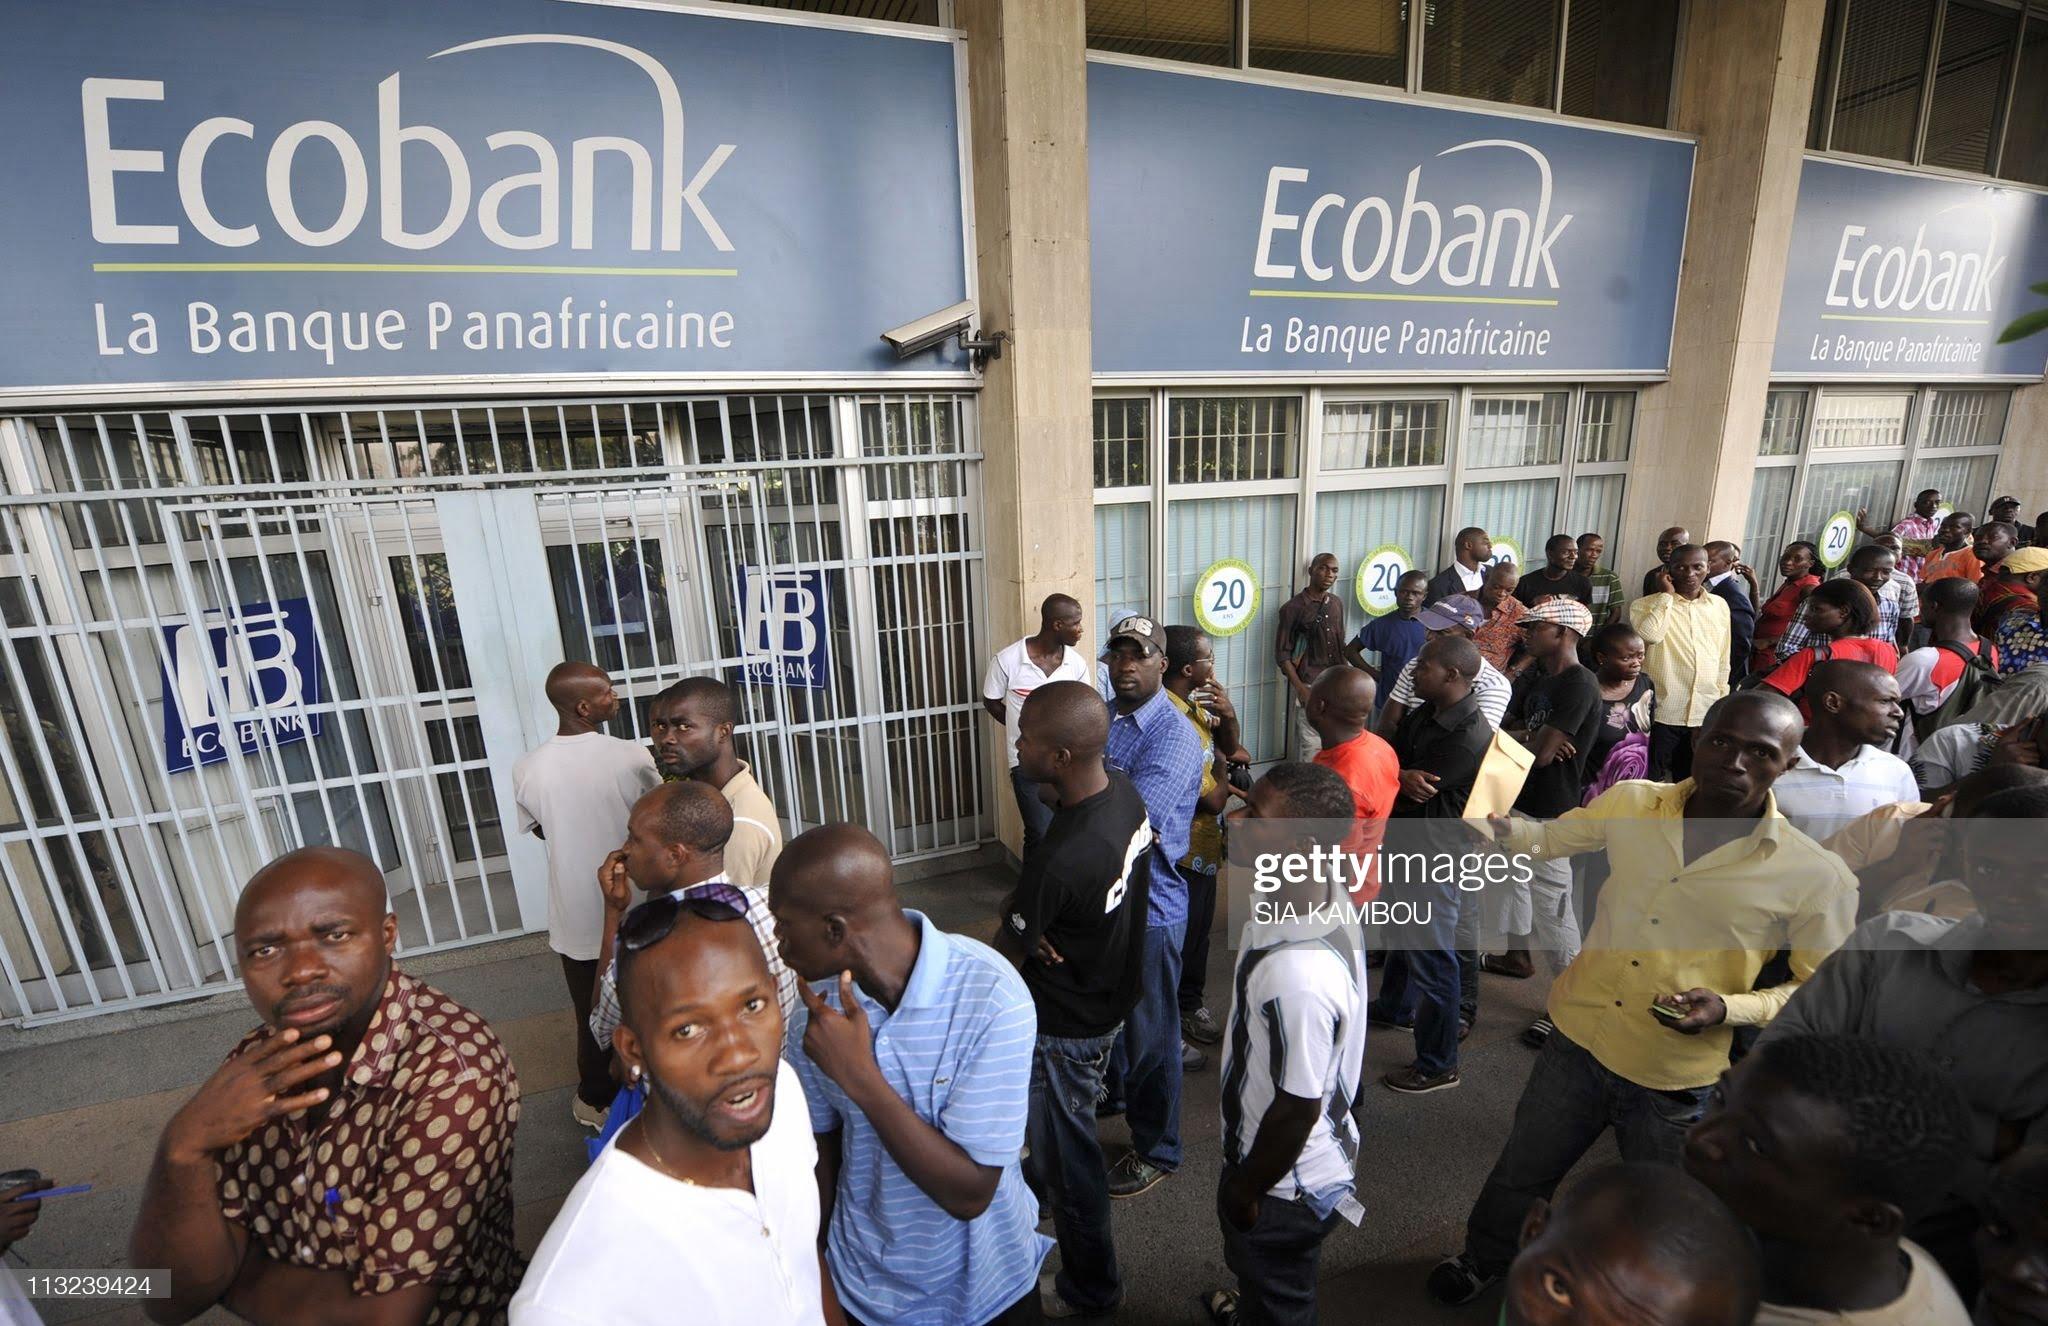 Ecobank Côte-d'Ivoire will pay 250 million CFA francs in service allowances over 2021 (record profit)